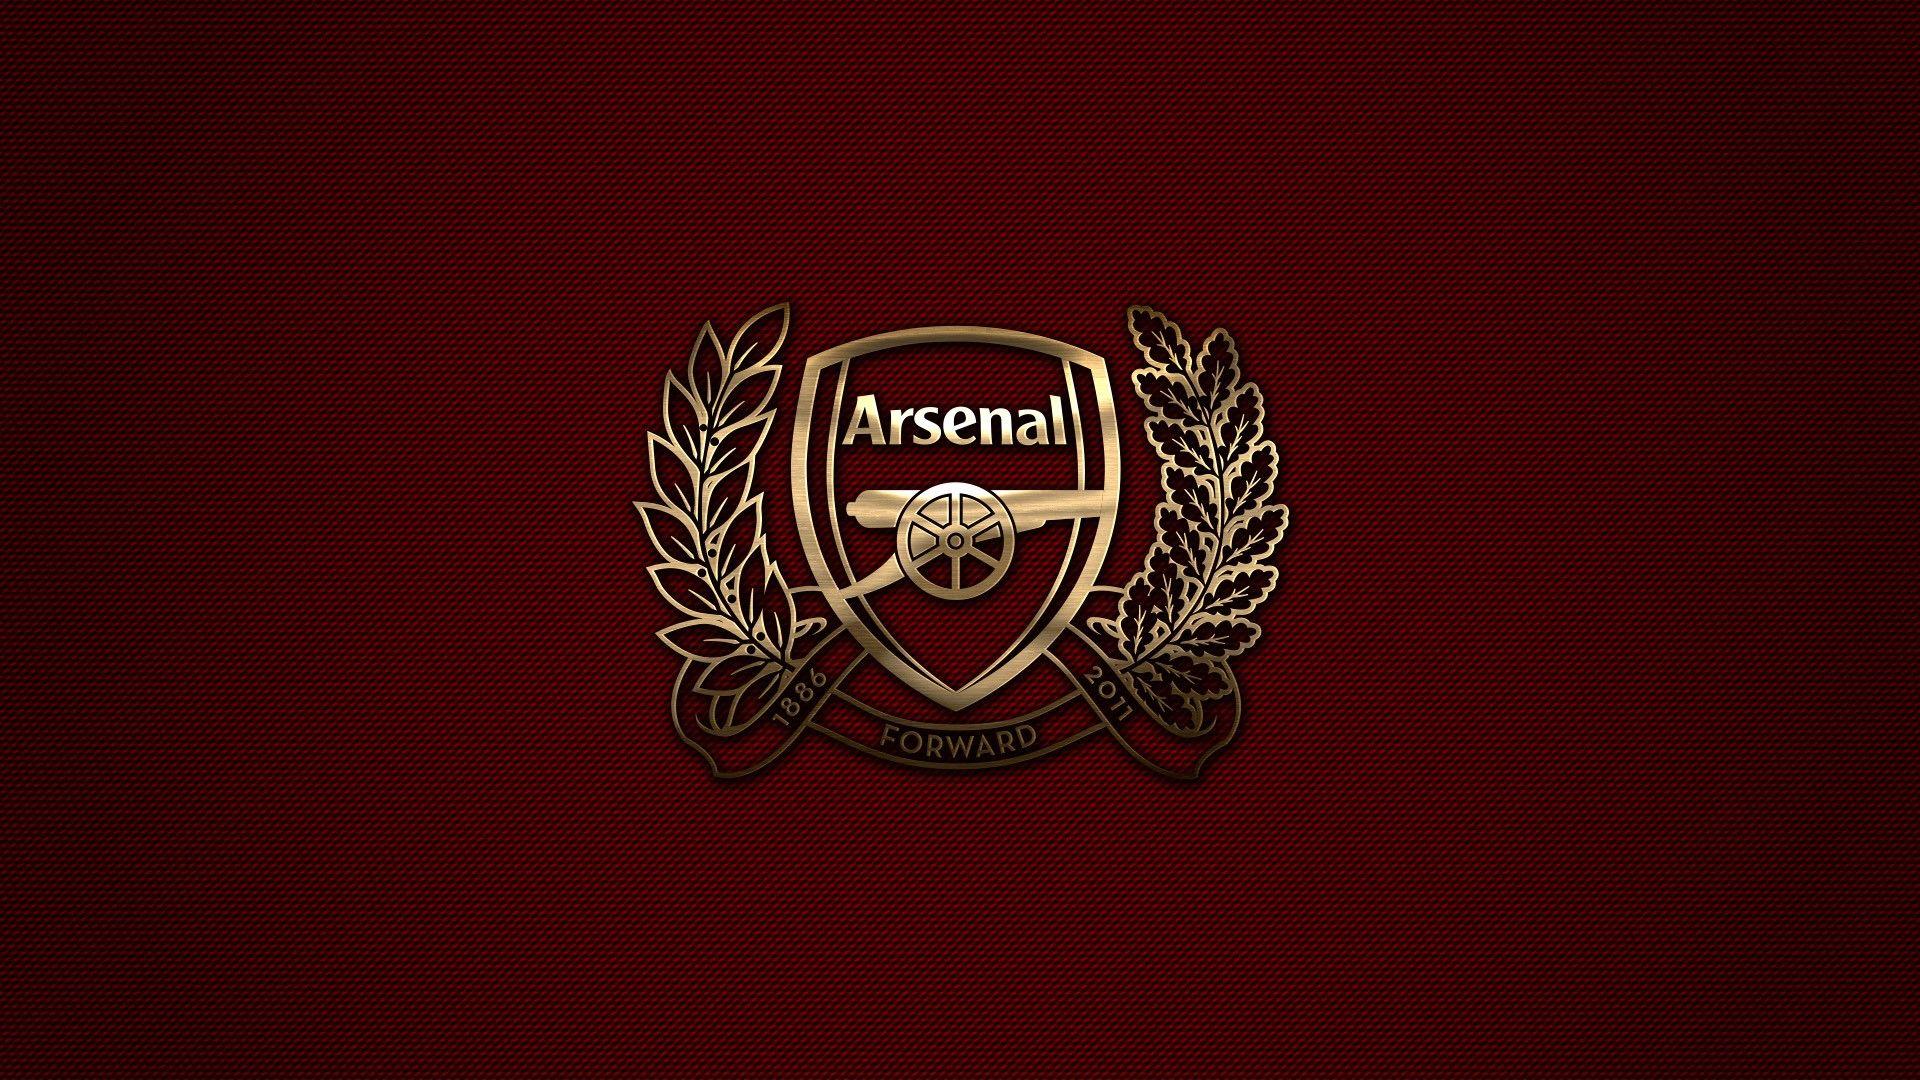 Arsenal Logo Wallpaper HD   Wallpaper   Pinterest   Arsenal wallpapers, Arsenal and Wallpaper